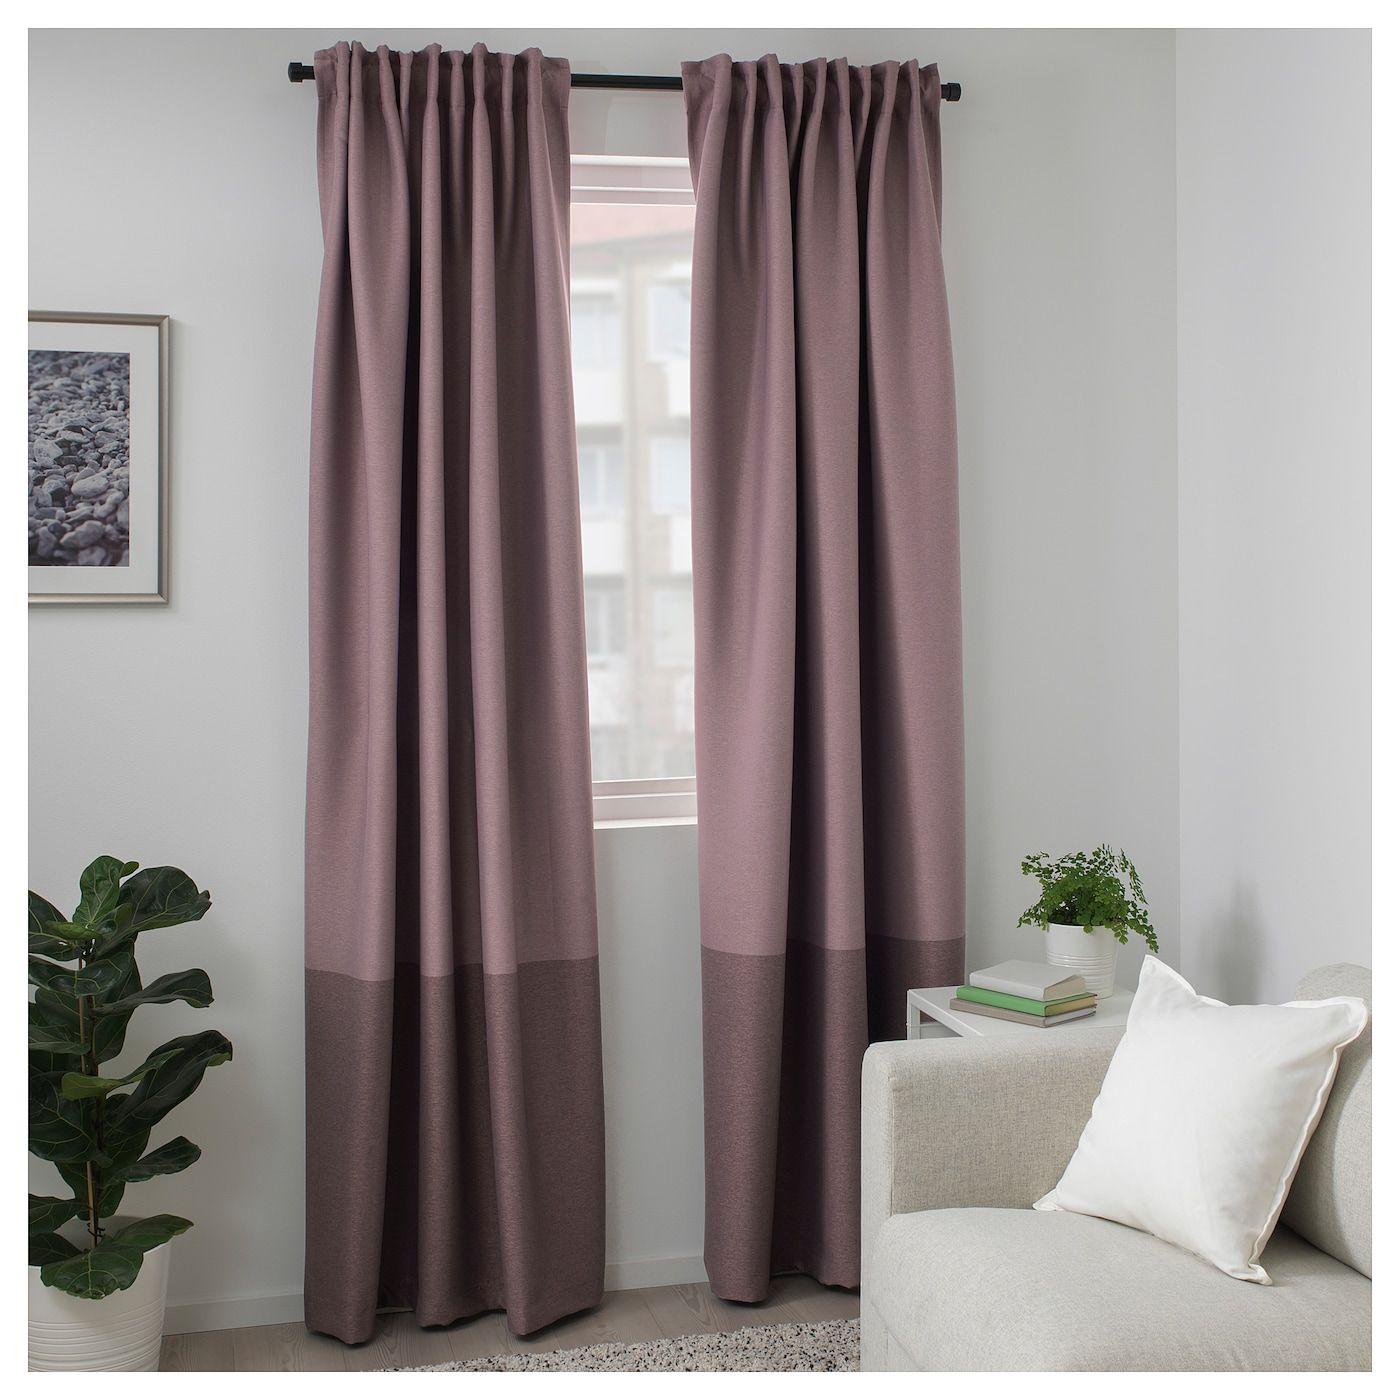 Marjun Room Darkening Curtains 1 Pair Lilac 57x98 145x250 Cm